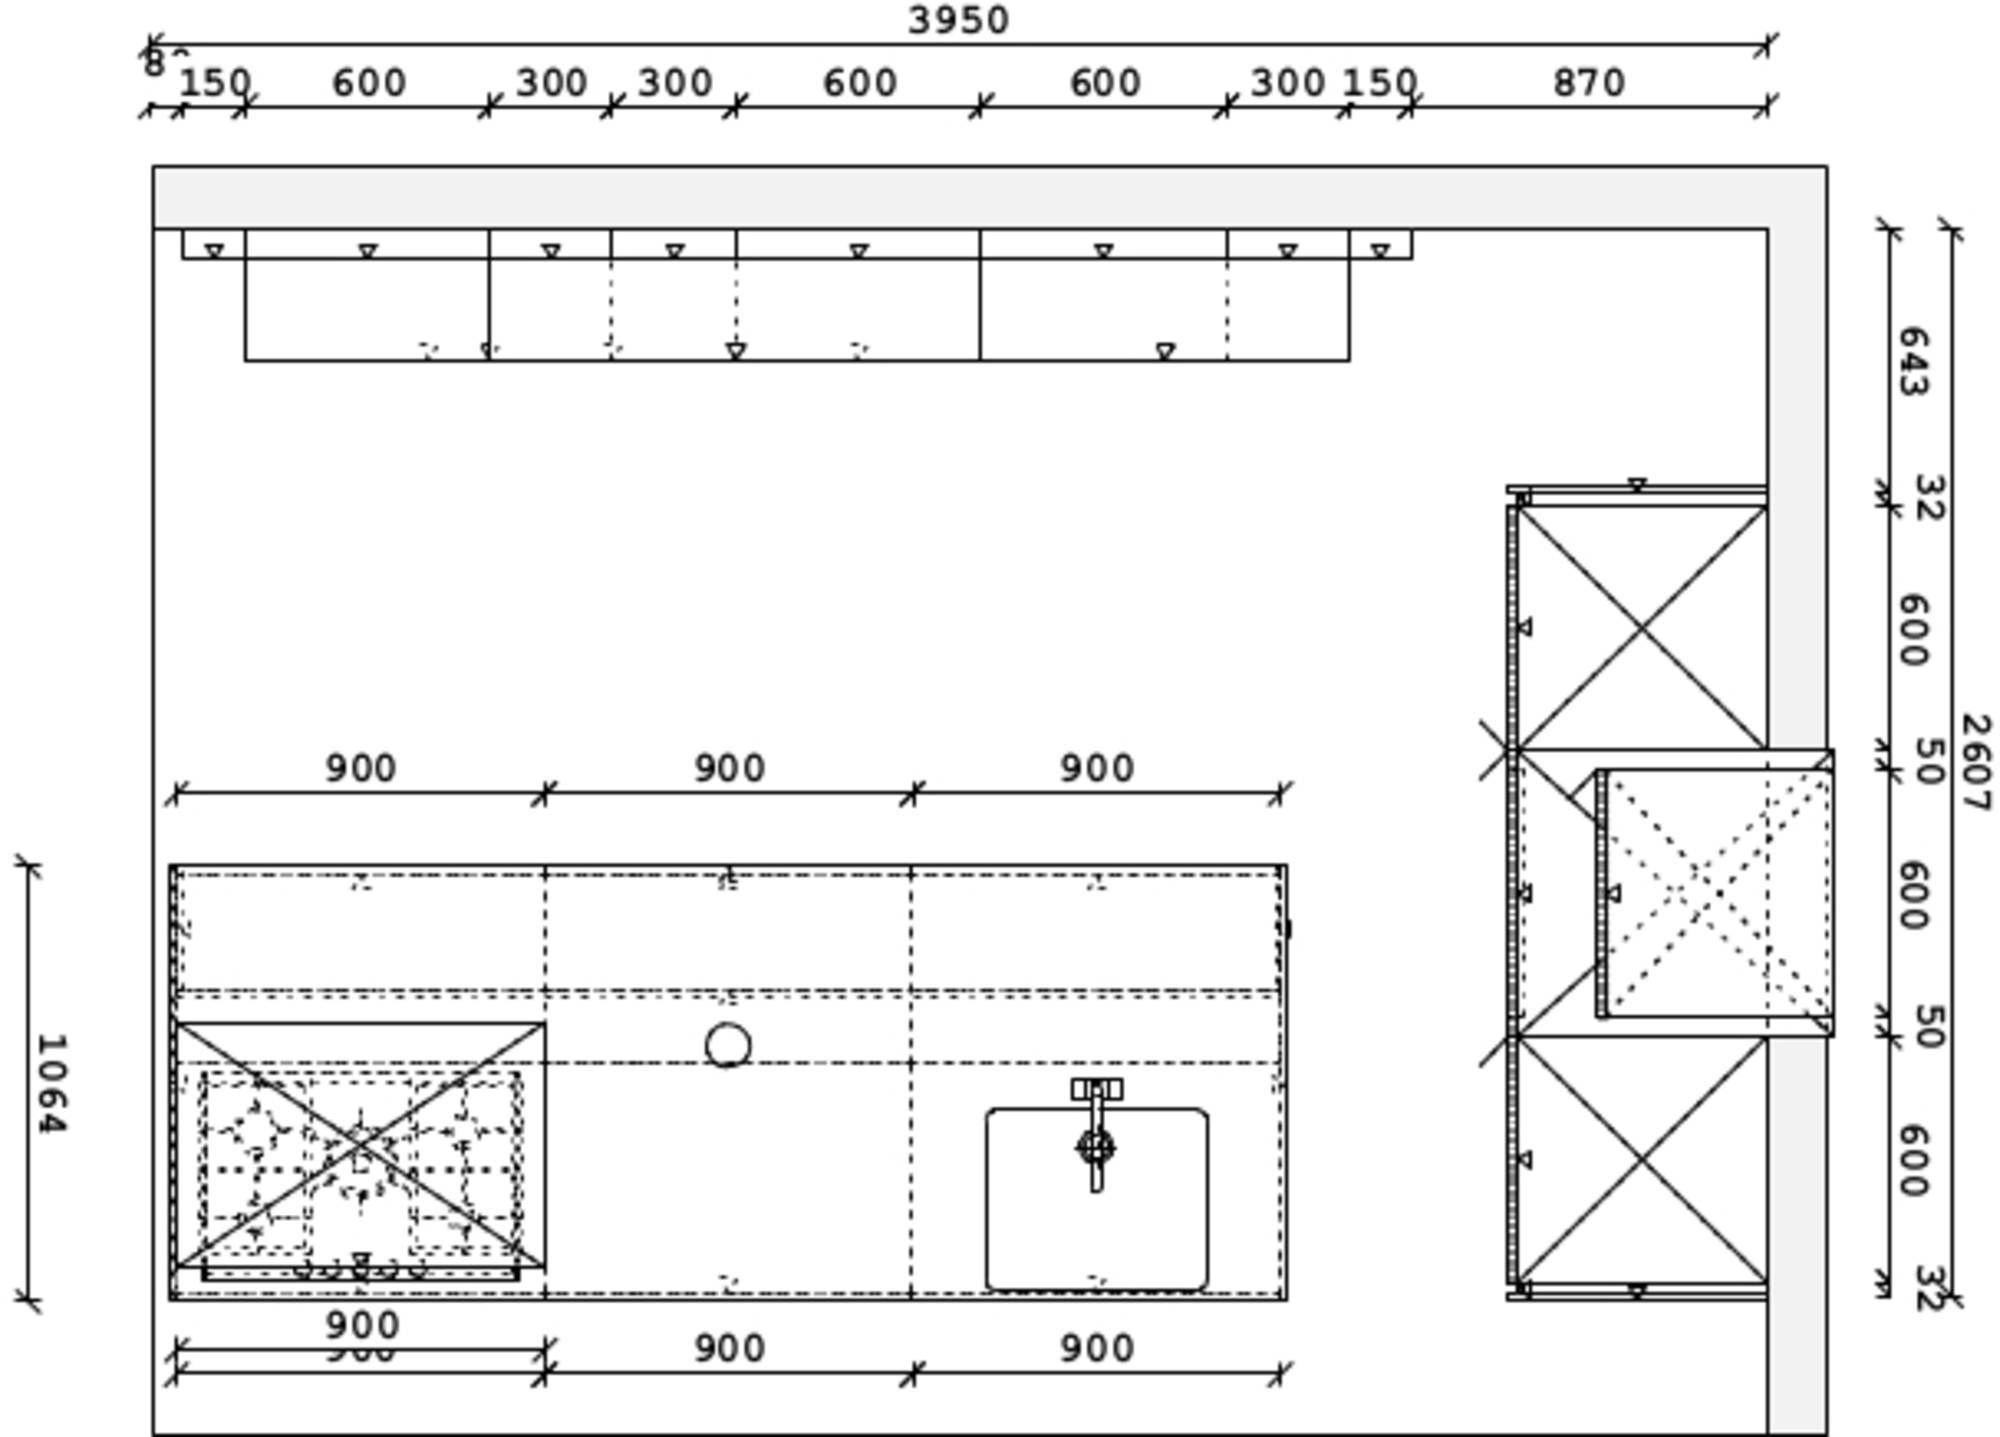 SieMatic eilandkeuken S2SLM / S2H / C41